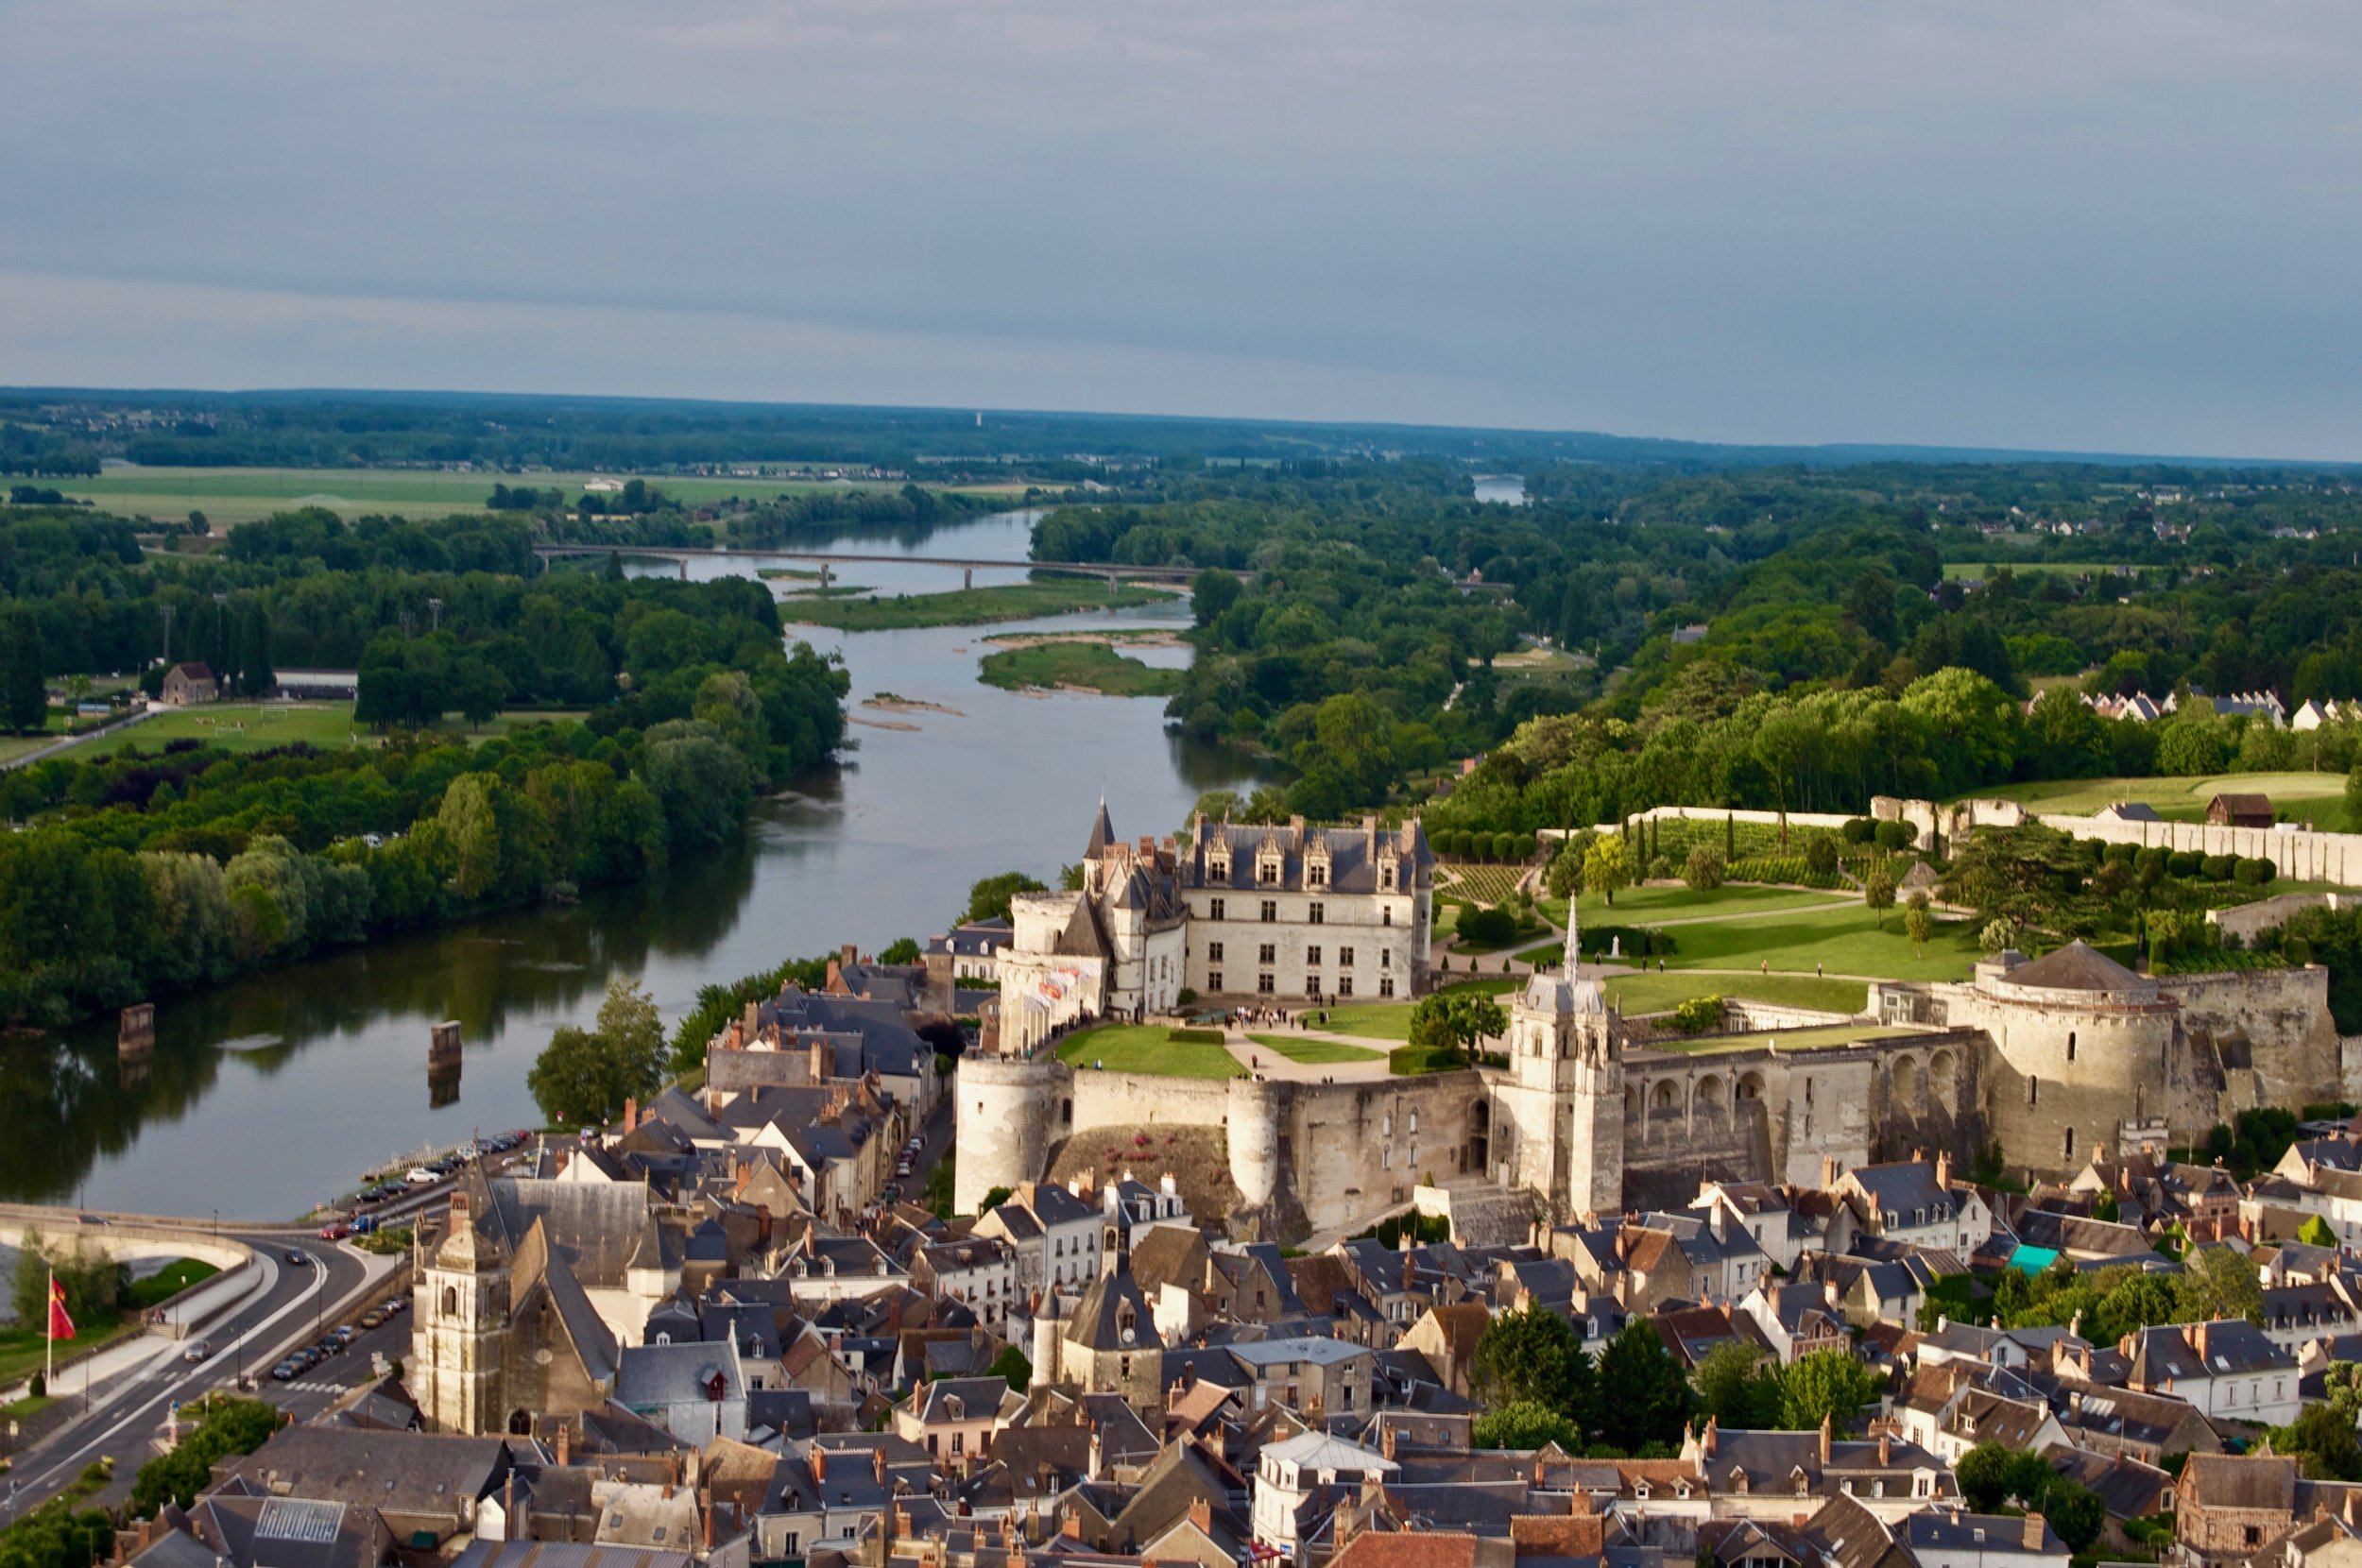 Amboise Chateau - 5 Most Magnificent Castles of the Loire Valley - A Happy Passport #chateau #castle #france #amboise